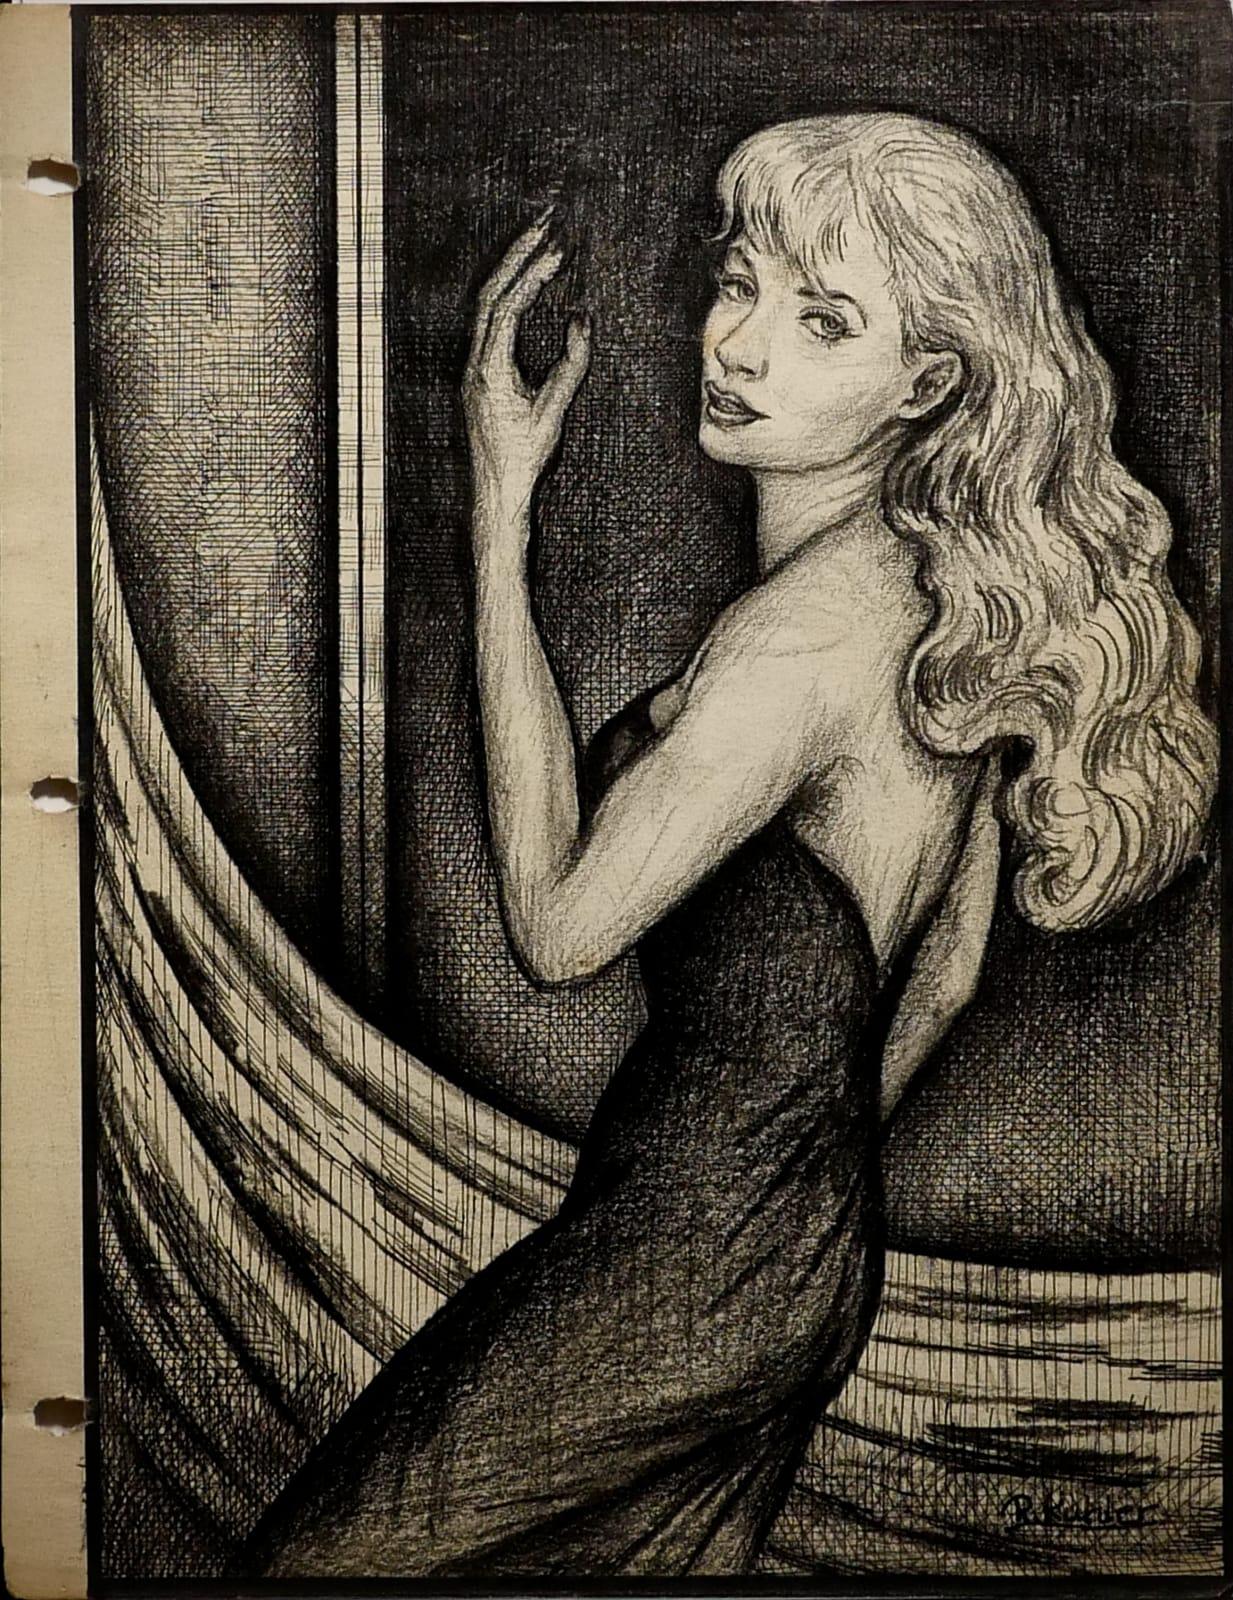 Rebecca de Rochelle Stierenholm, 1955 Ink, pencil on sketch paper 11 x 8 1/2 in (RK 116) $7,000